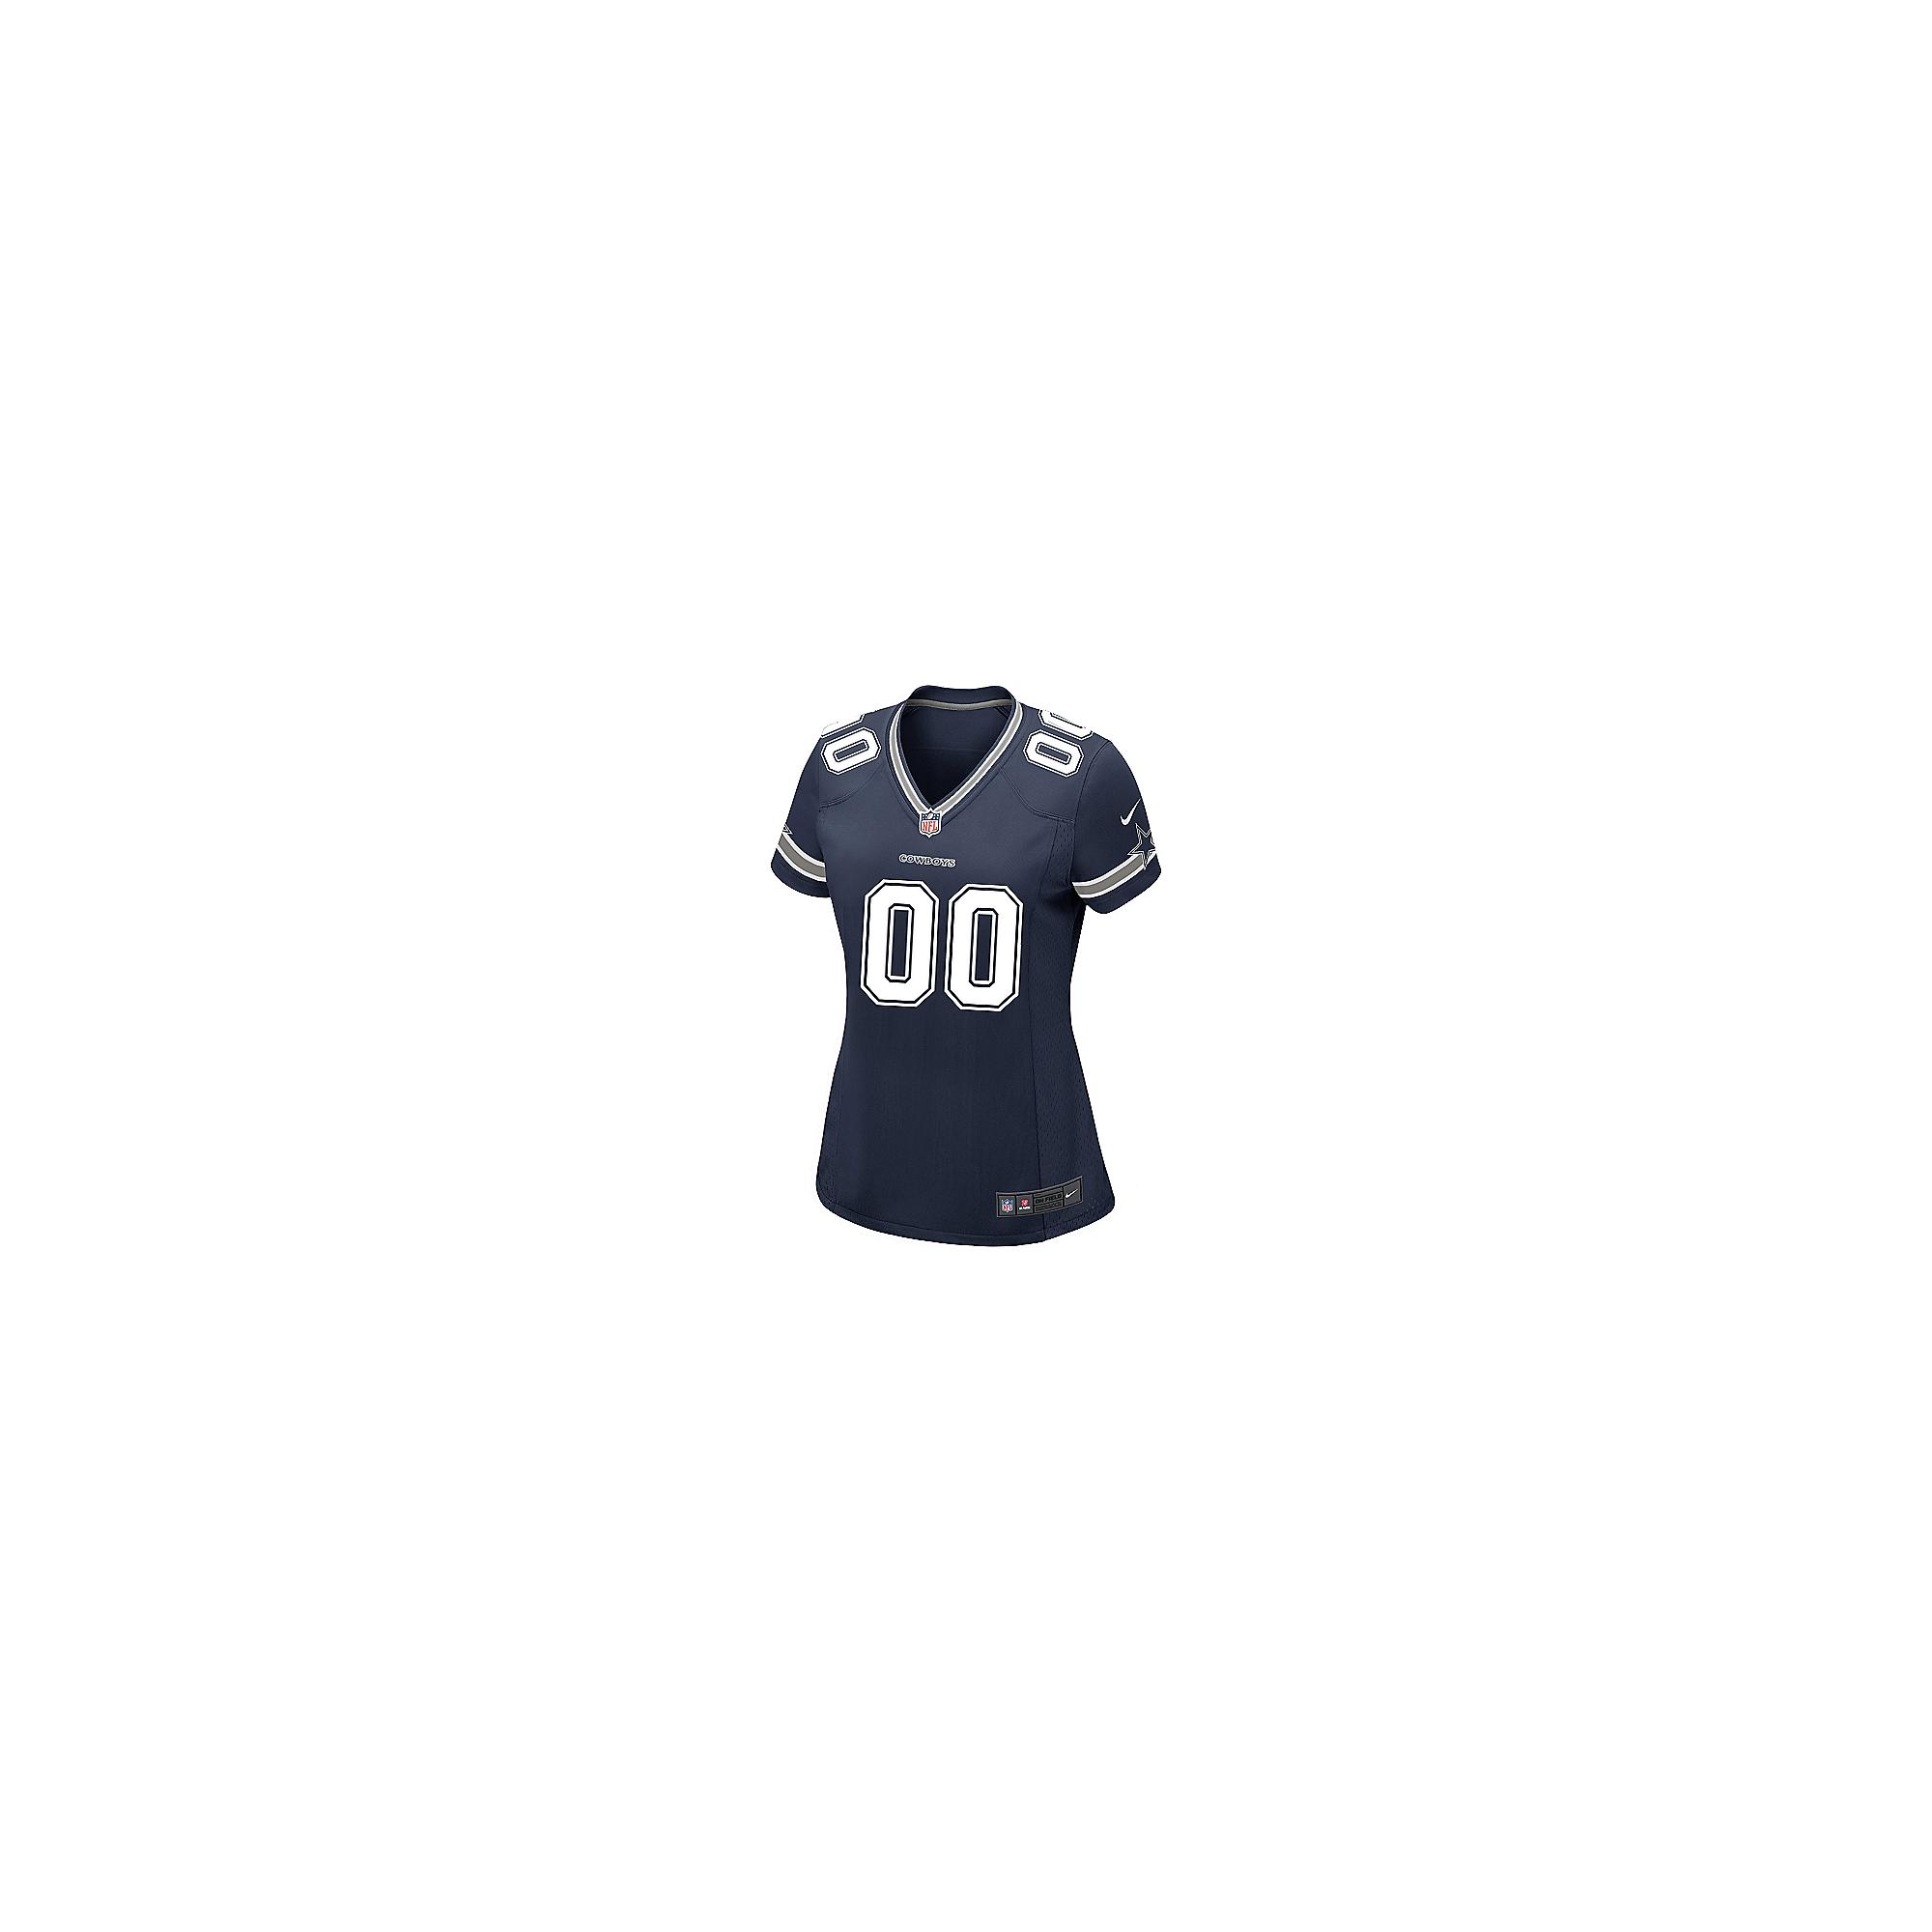 041f4524 Dallas Cowboys Womens Custom Nike Navy Game Replica Jersey | Dallas Cowboys  Pro Shop